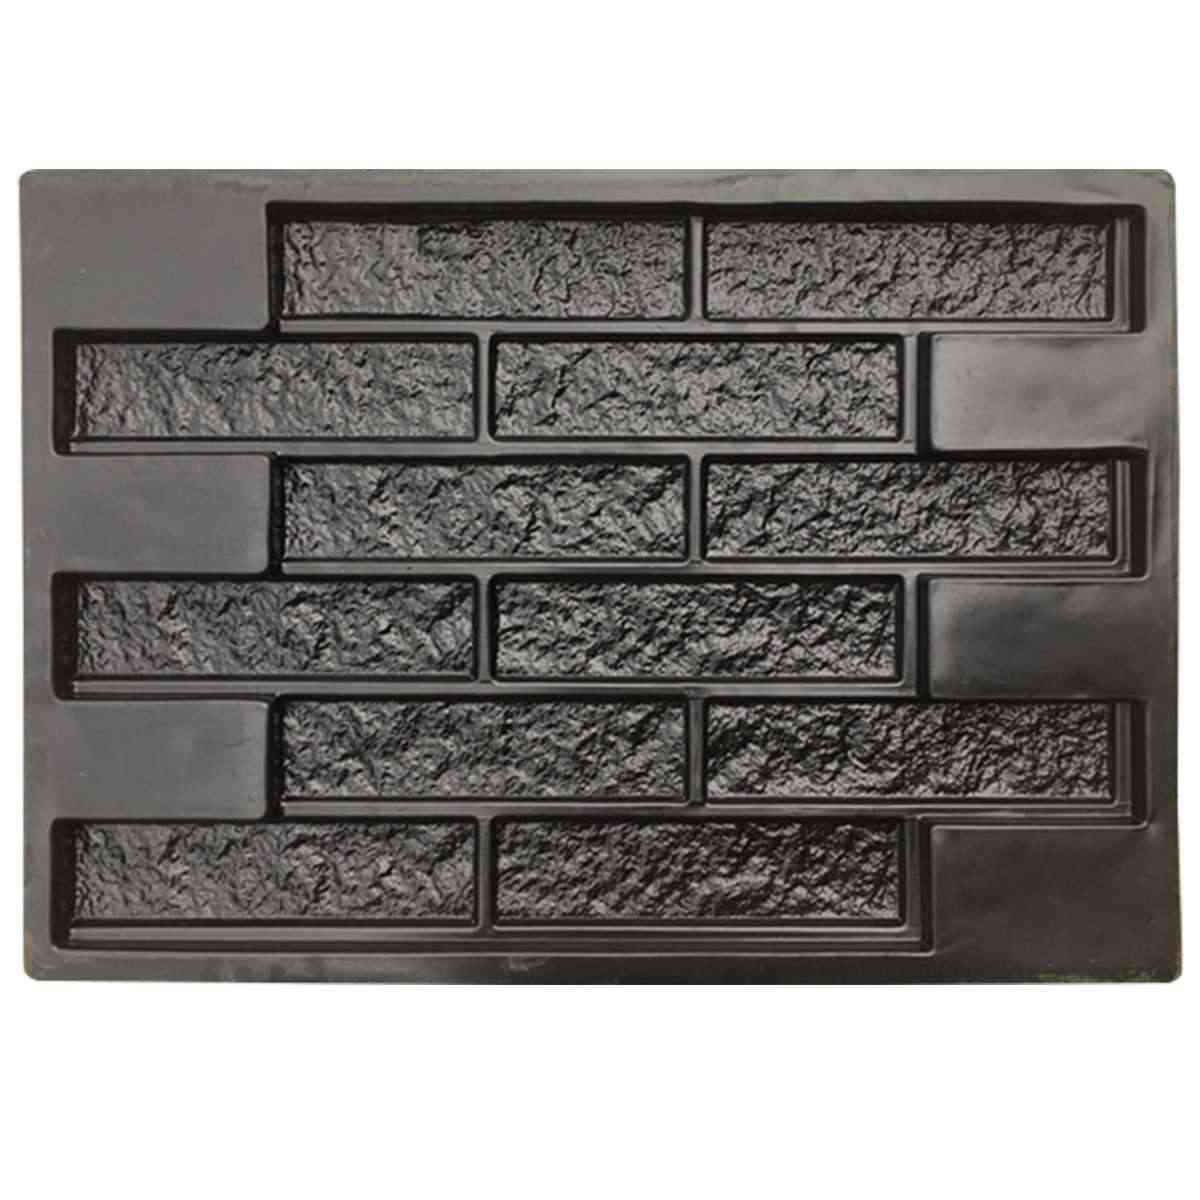 68.5*49*2.6 cm ריצוף עובש גן אמנות קרפט נתיב בחניה קיר אבן דקורטיבי בטון מלט עובש בריק DIY מבנים